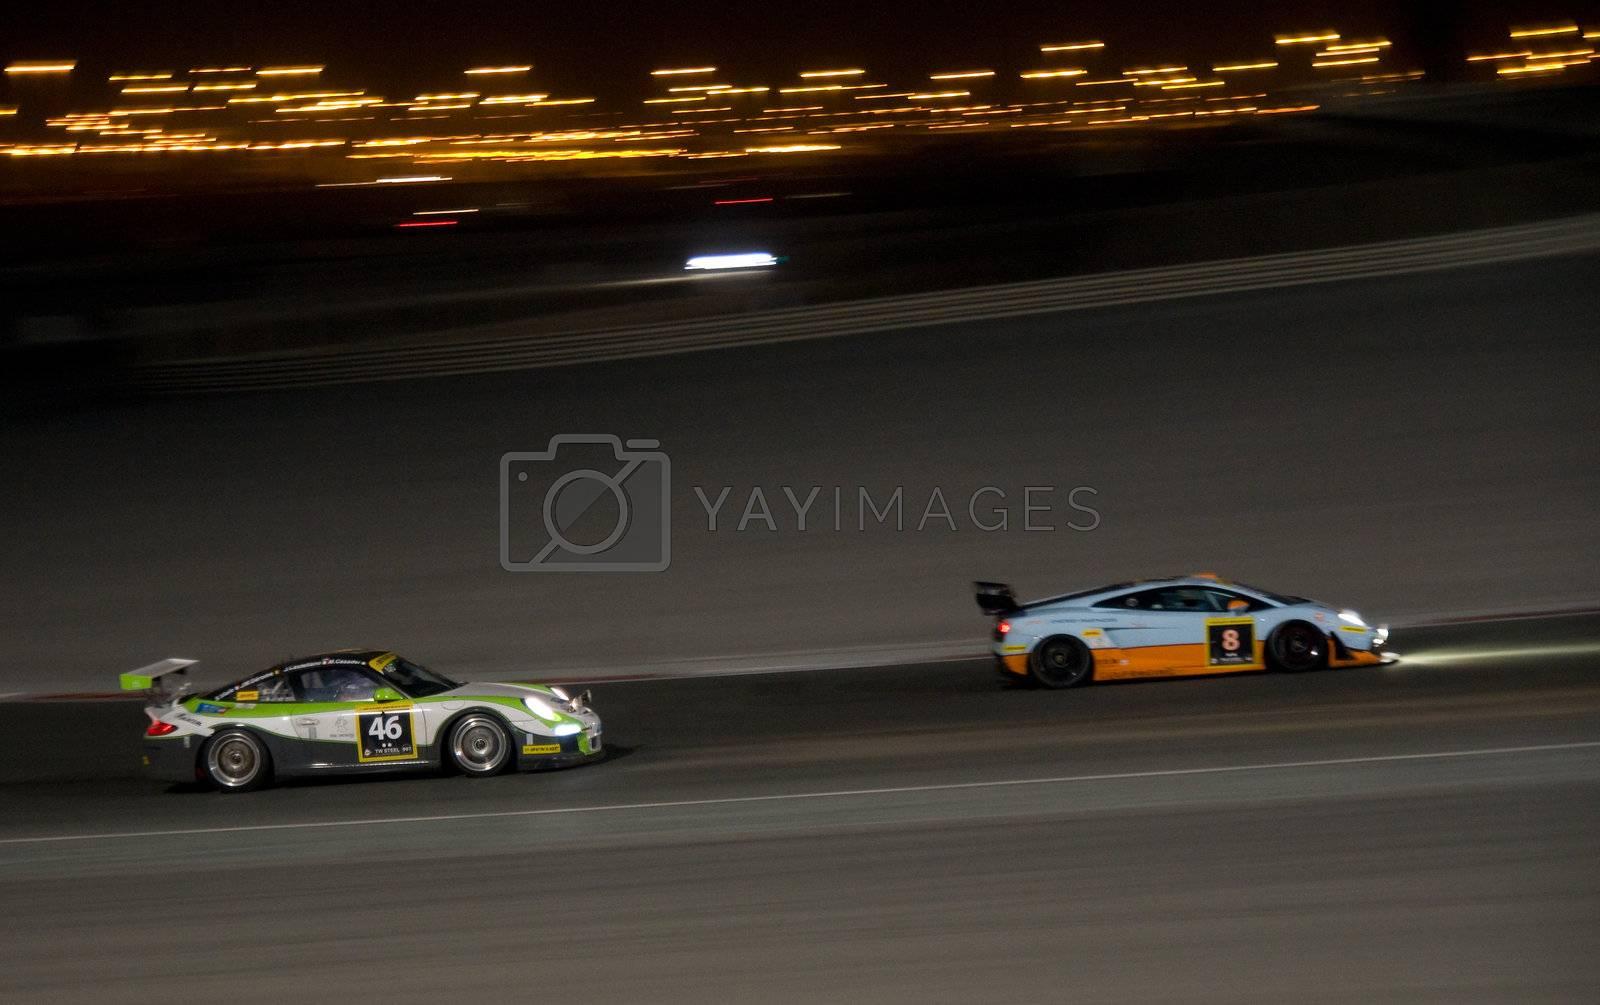 DUBAI - JANUARY 13: Porsche 997 GT3 Cup and Lamborghini Gallardo LP600 at night during the 2012 Dunlop 24 Hour Race at Dubai Autodrome on January 13, 2012.